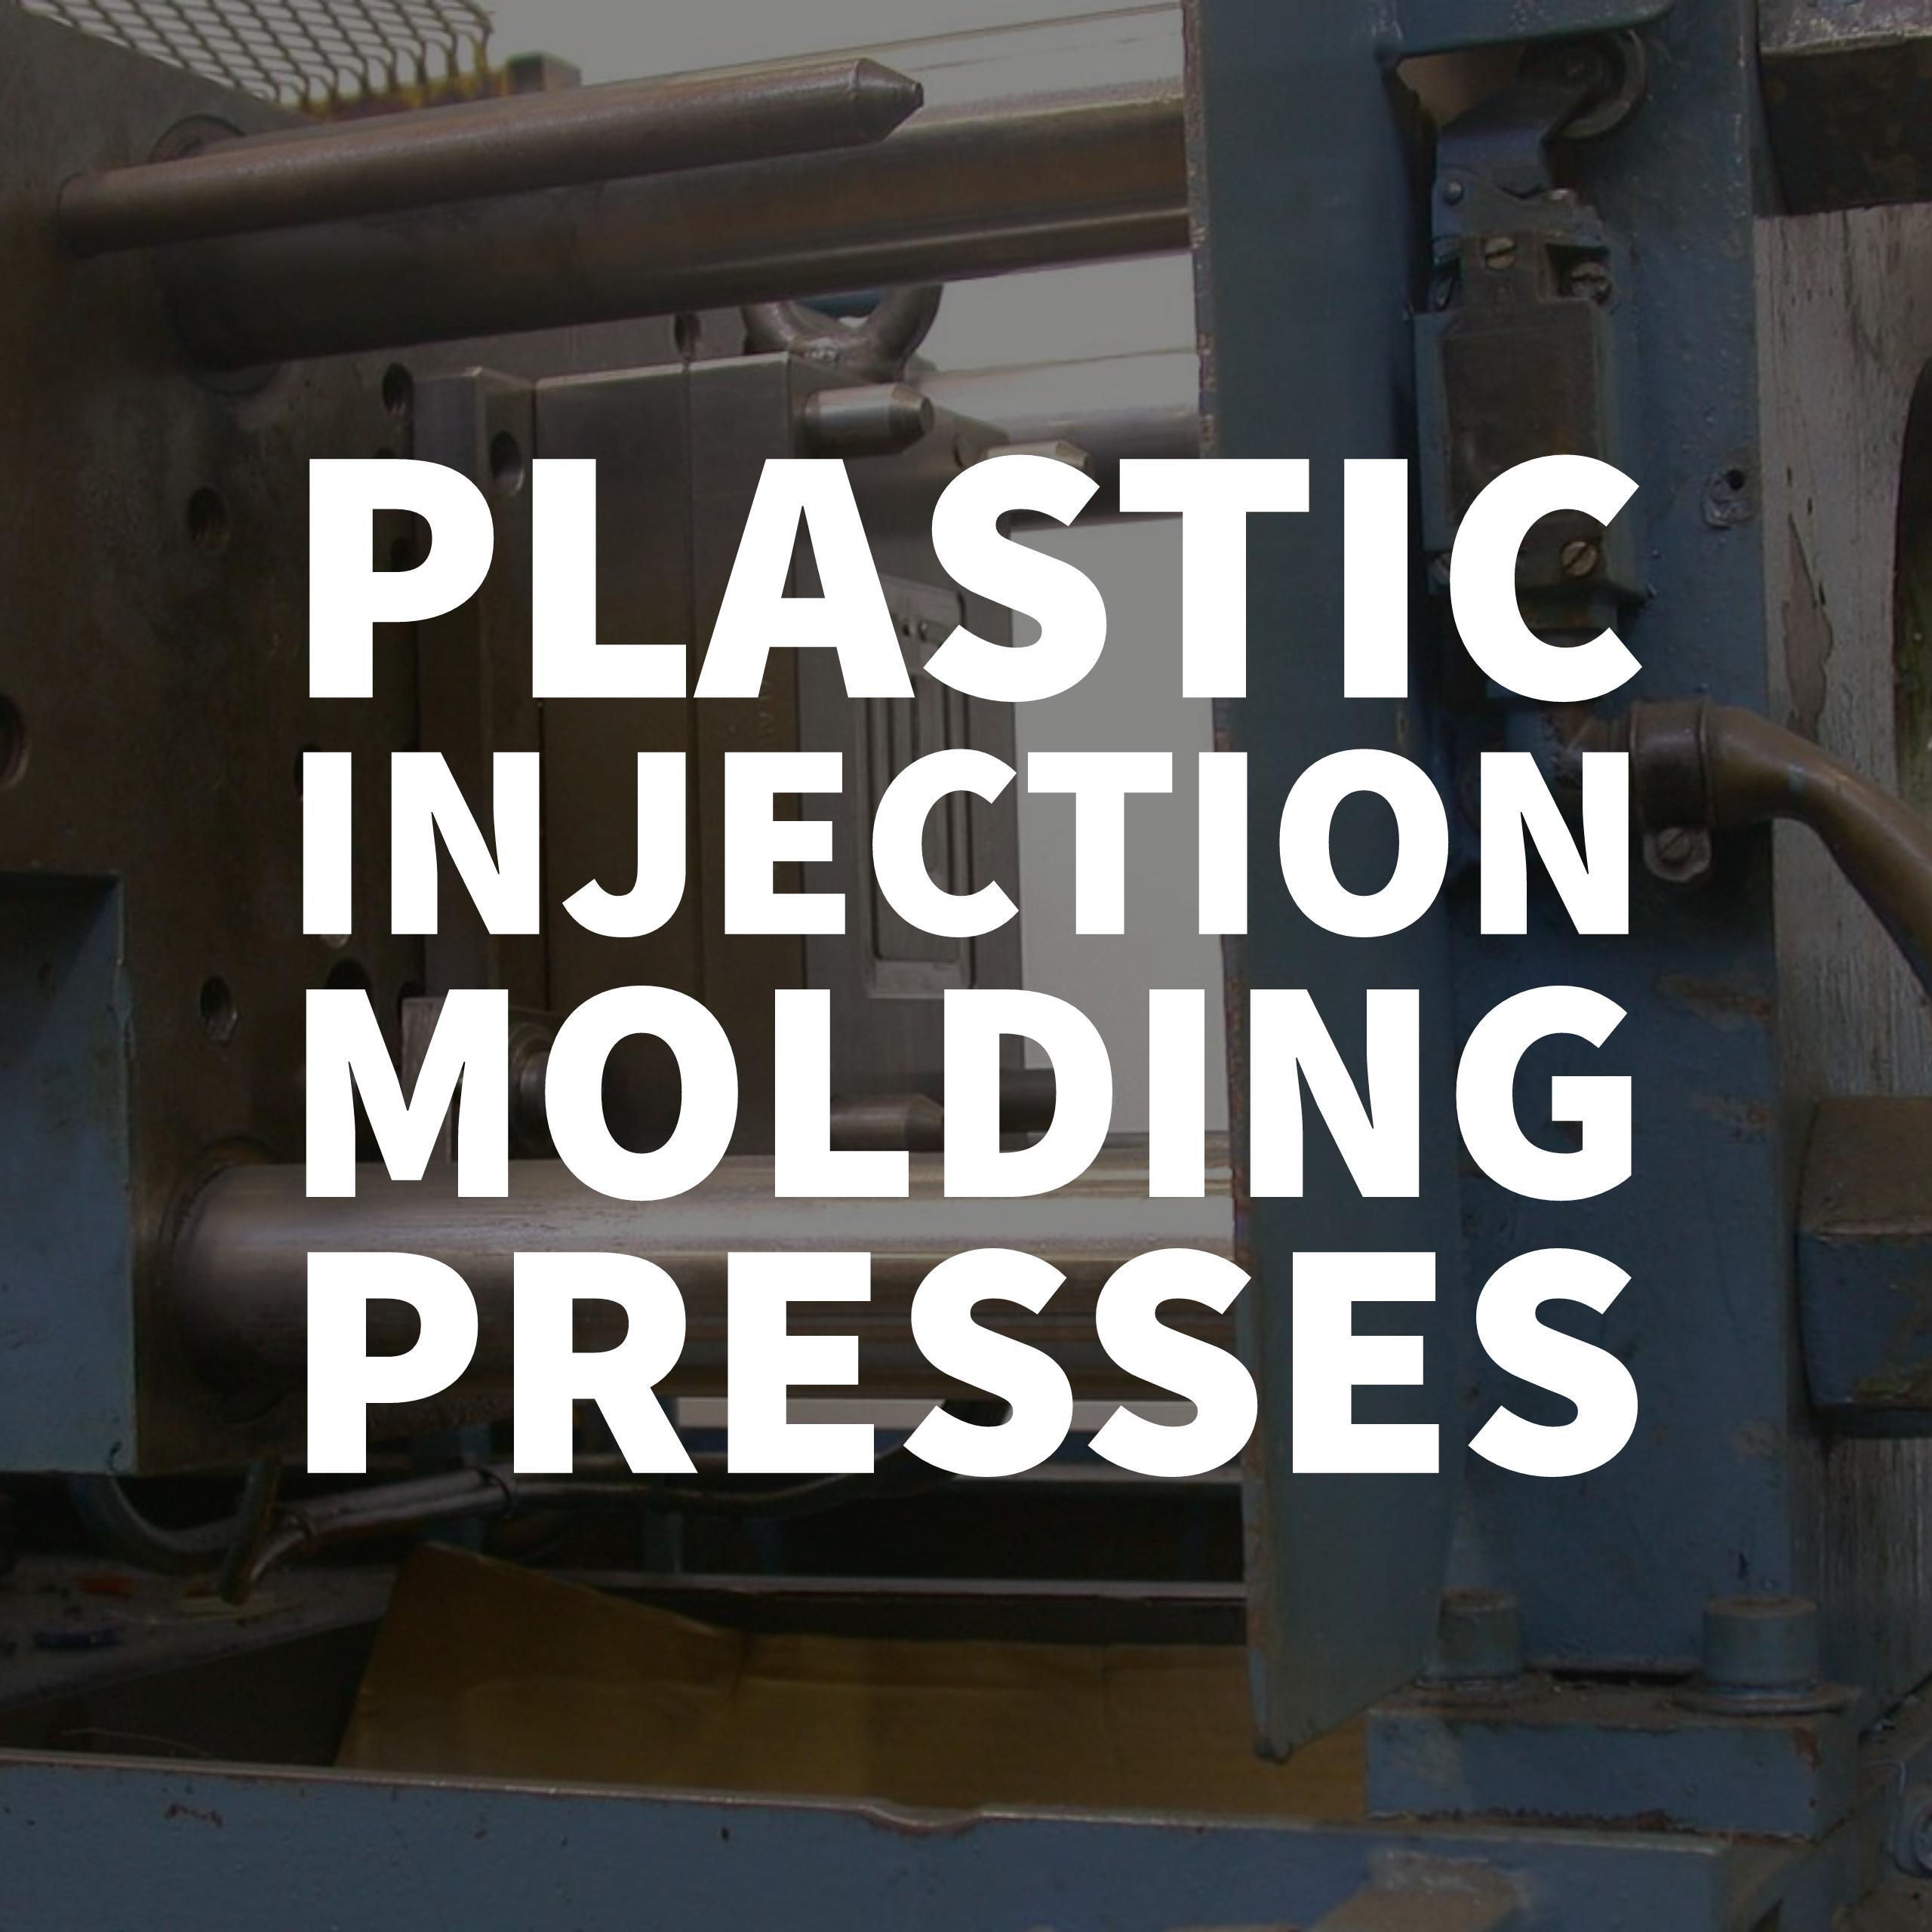 plastic injection molding presses